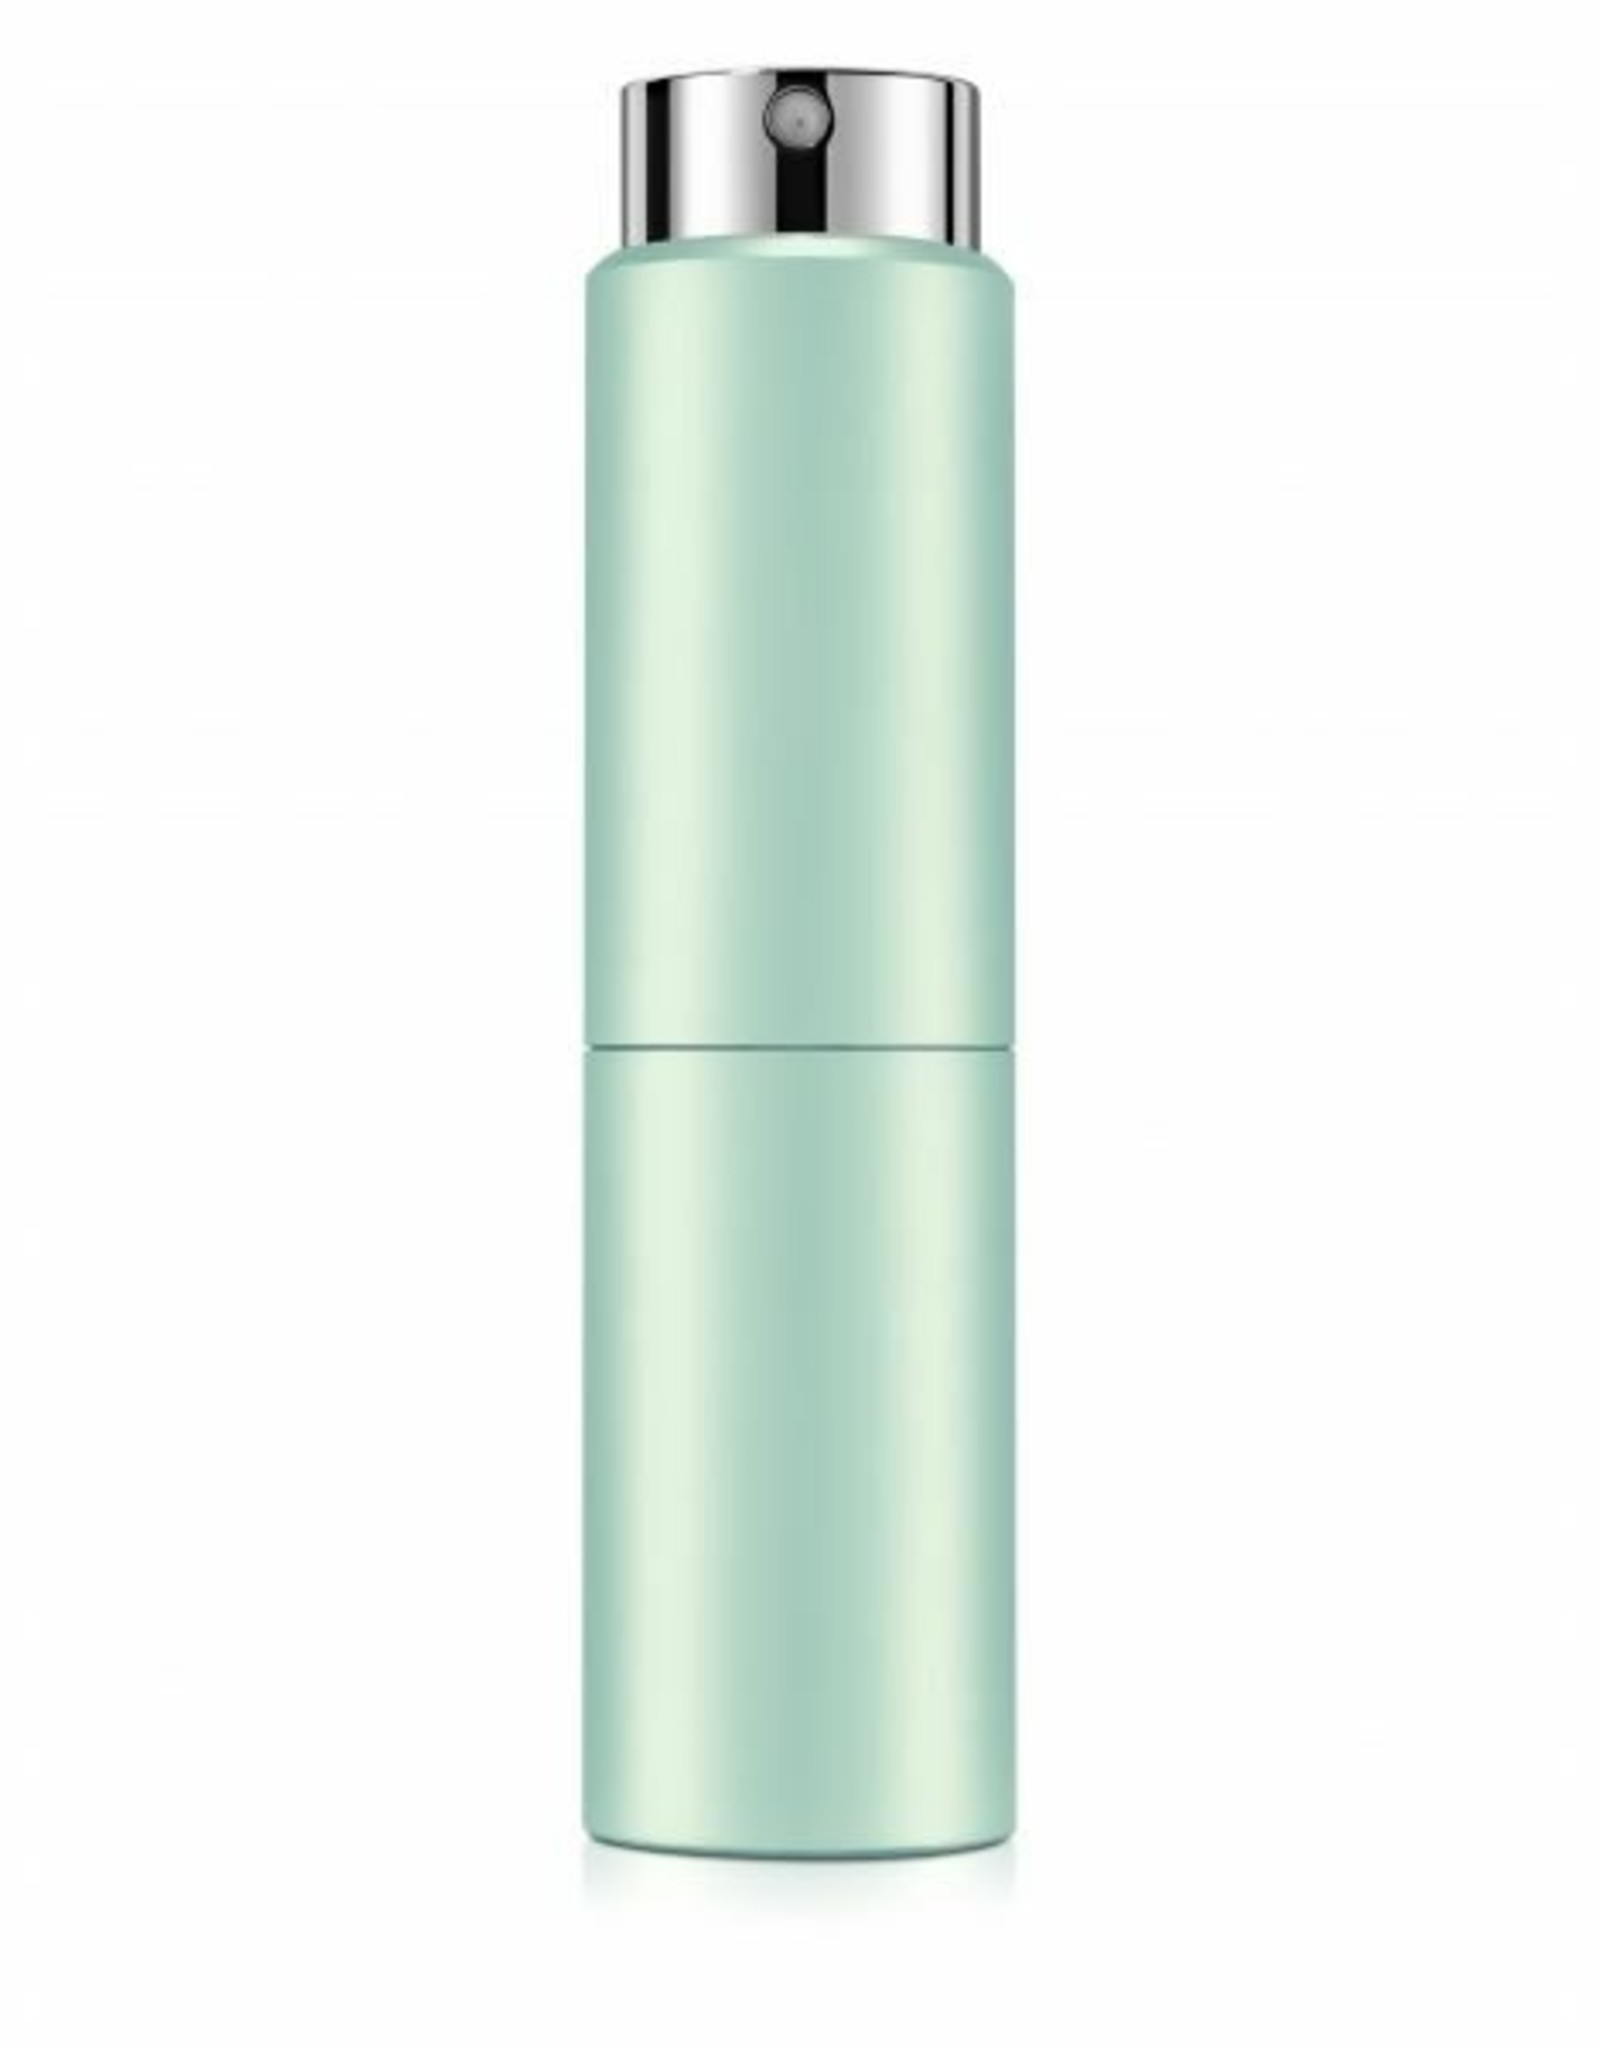 Equivalenza Mint Perfume Atomizer - 15ml